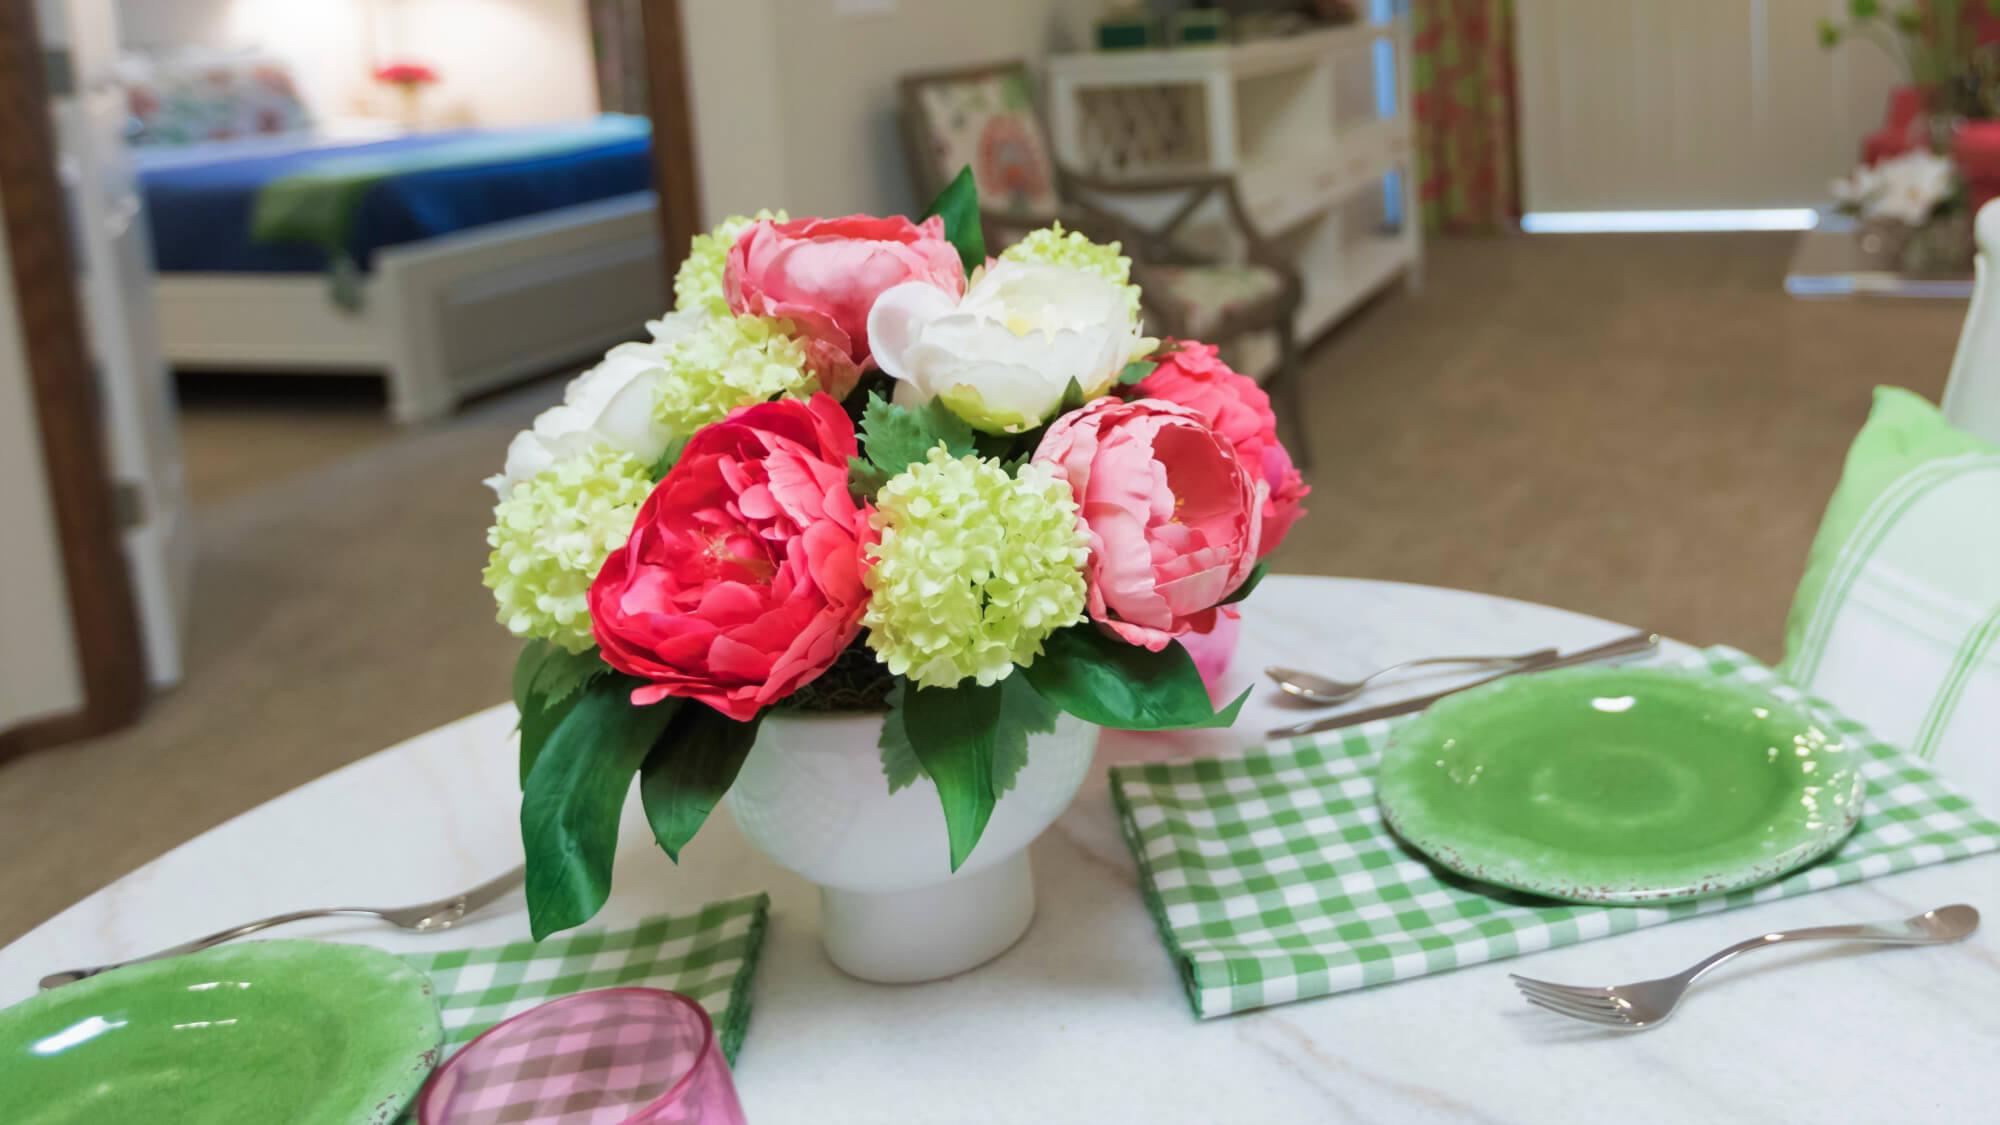 Stunning floral arrangement at Vickery Rose.